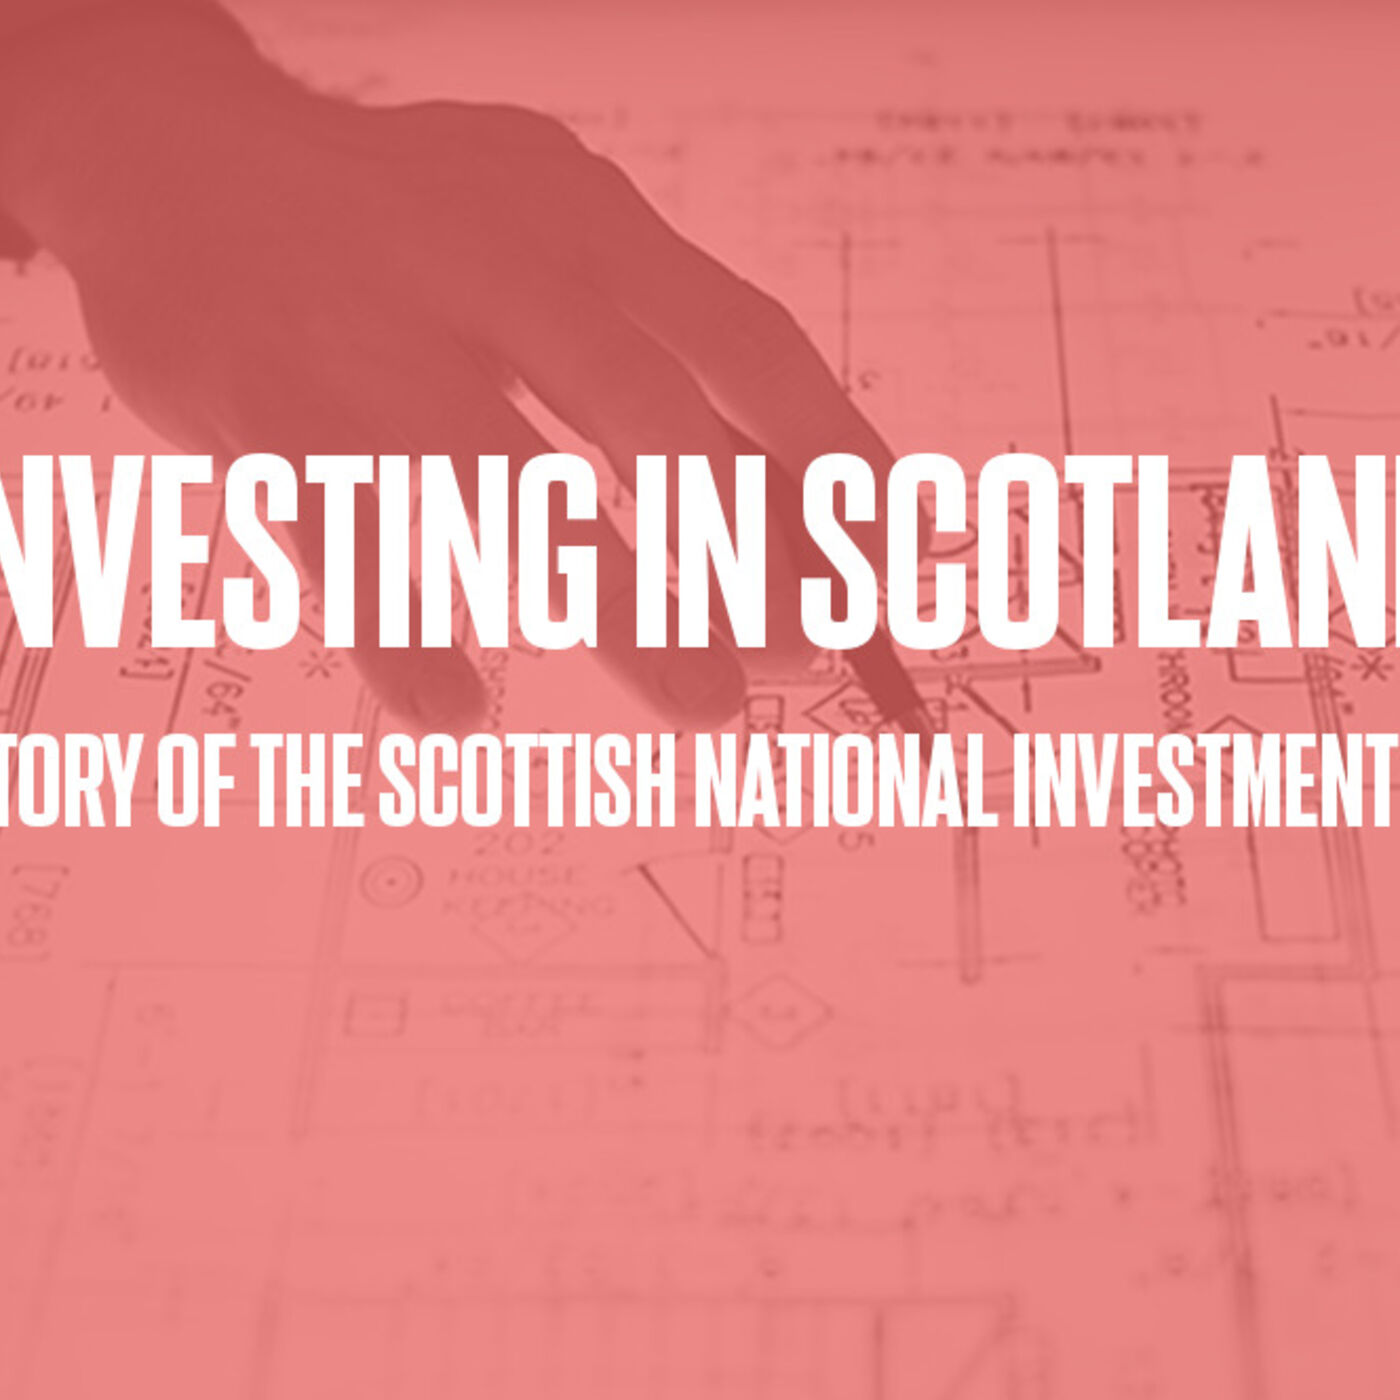 Episode #15 - Investing in Scotland